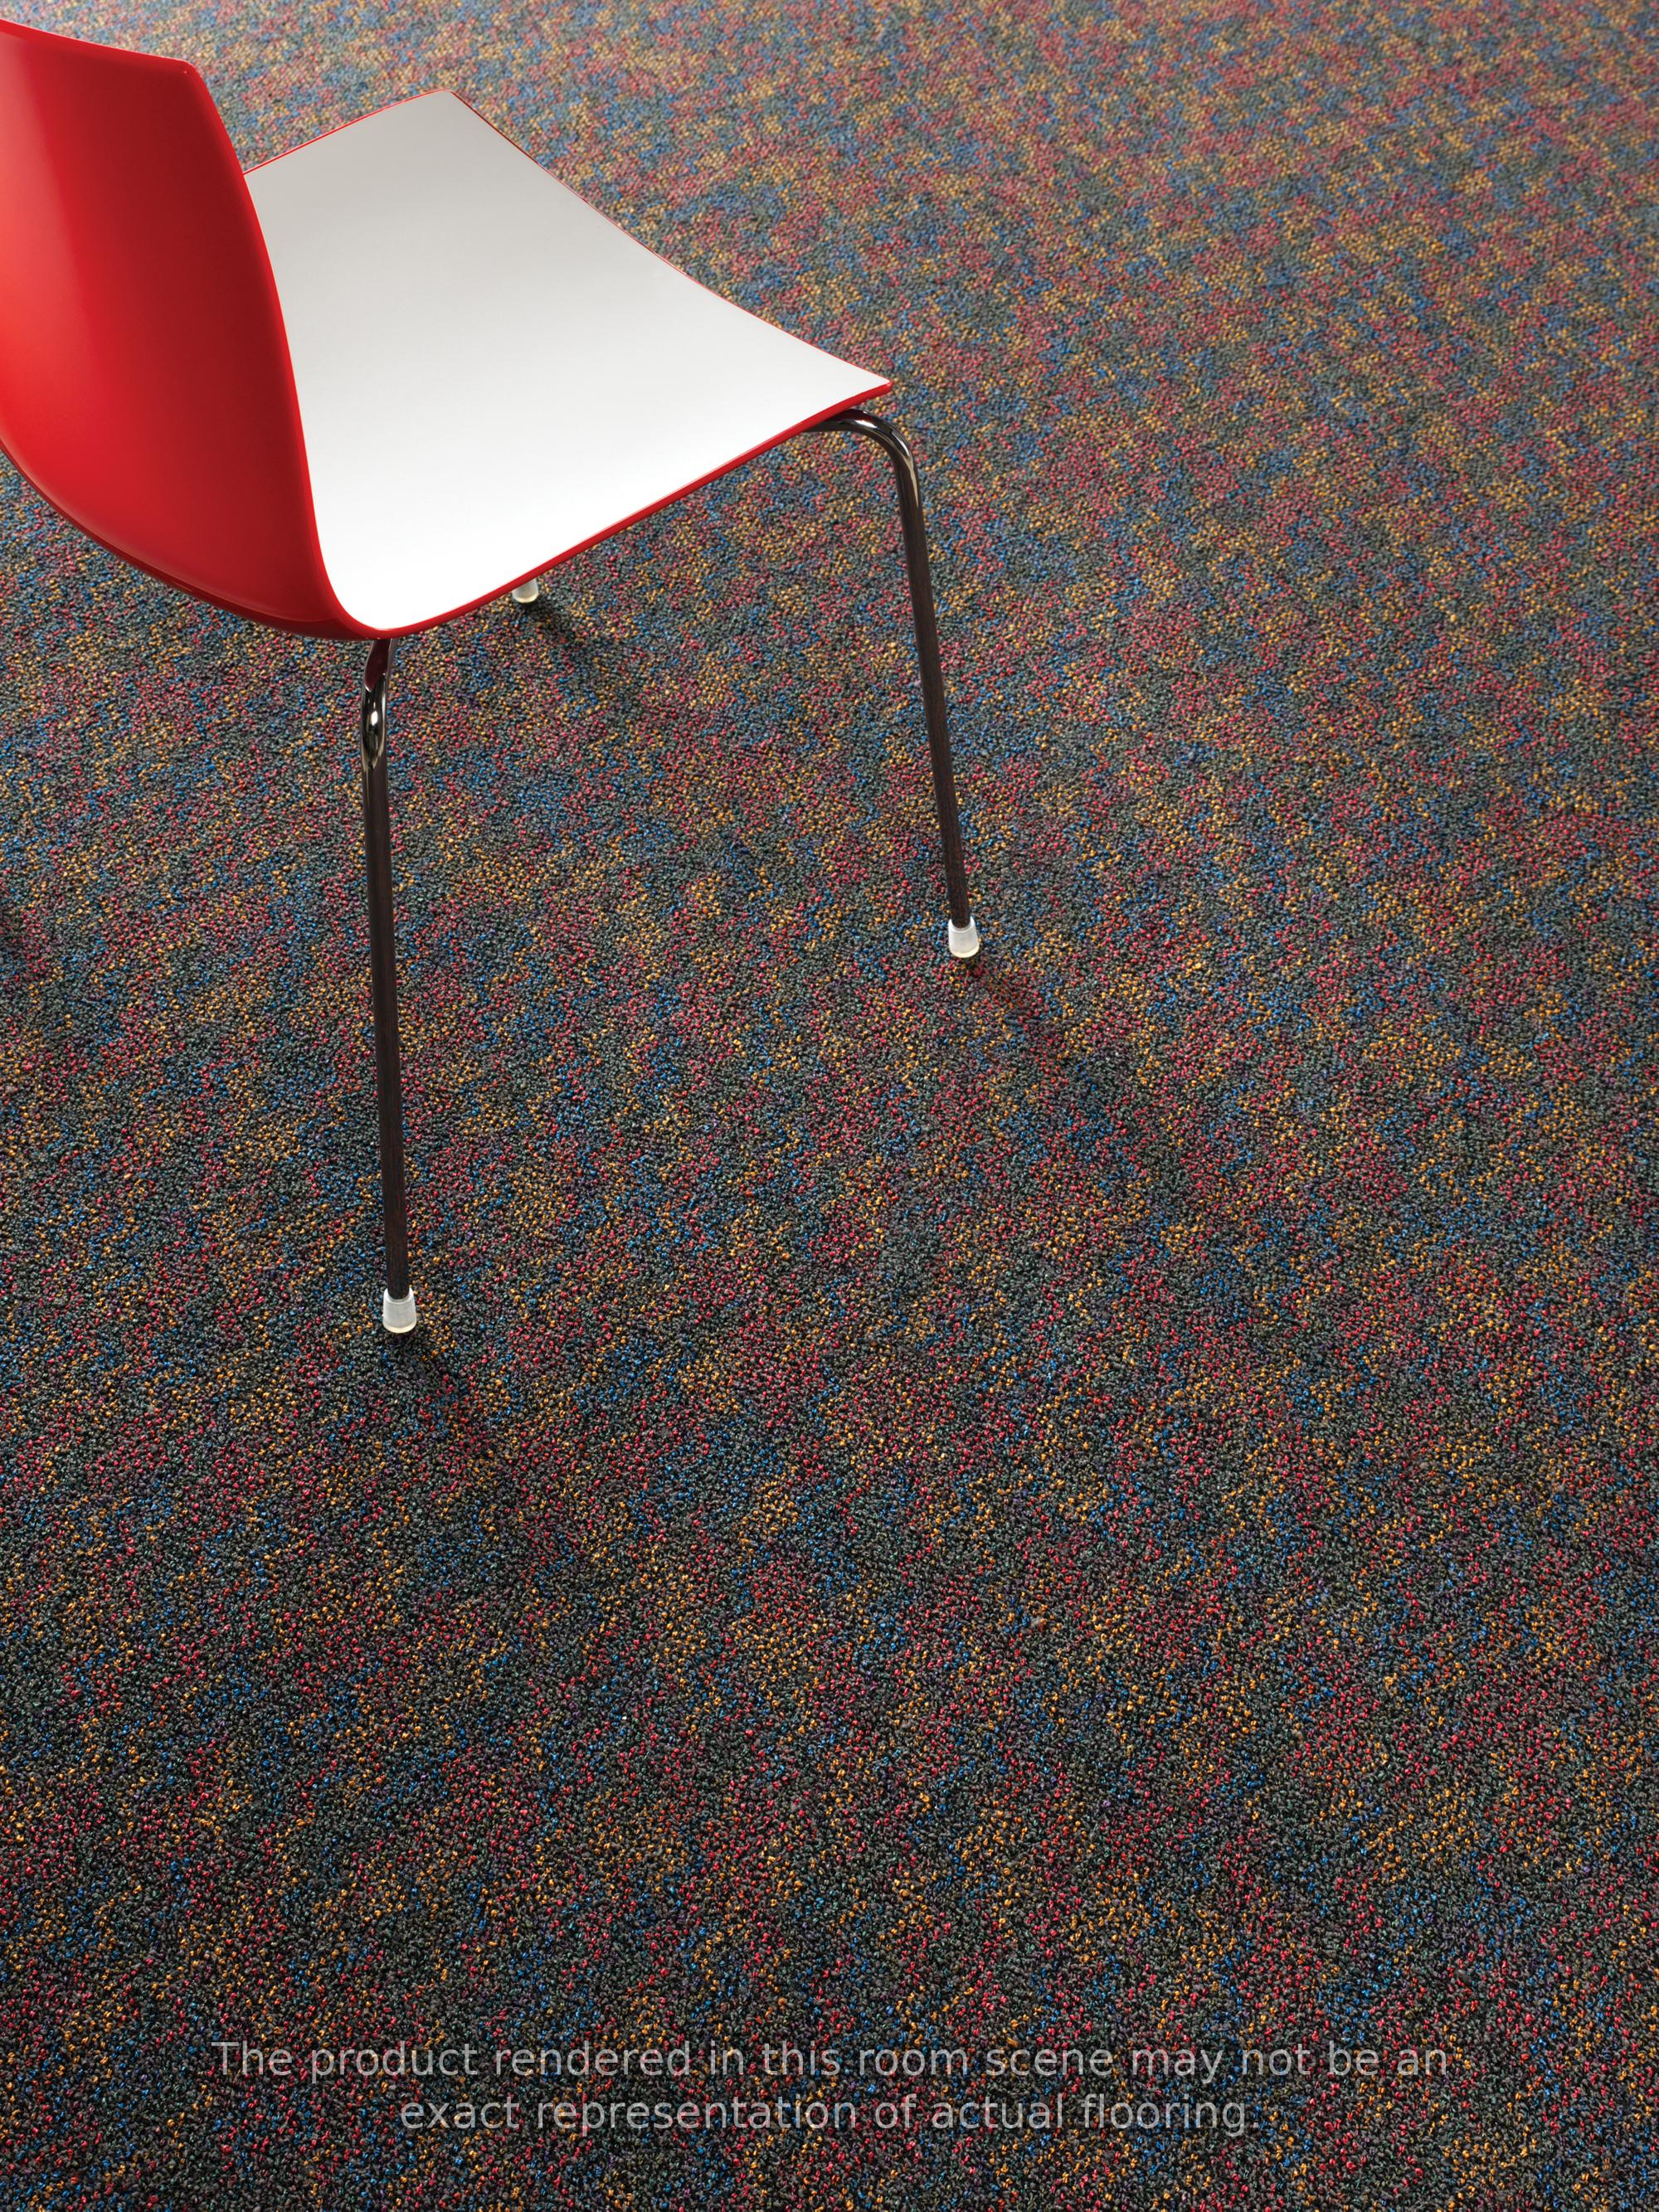 Broadloom Carpet - Sketch Pad - Reflective | Mohawk Group